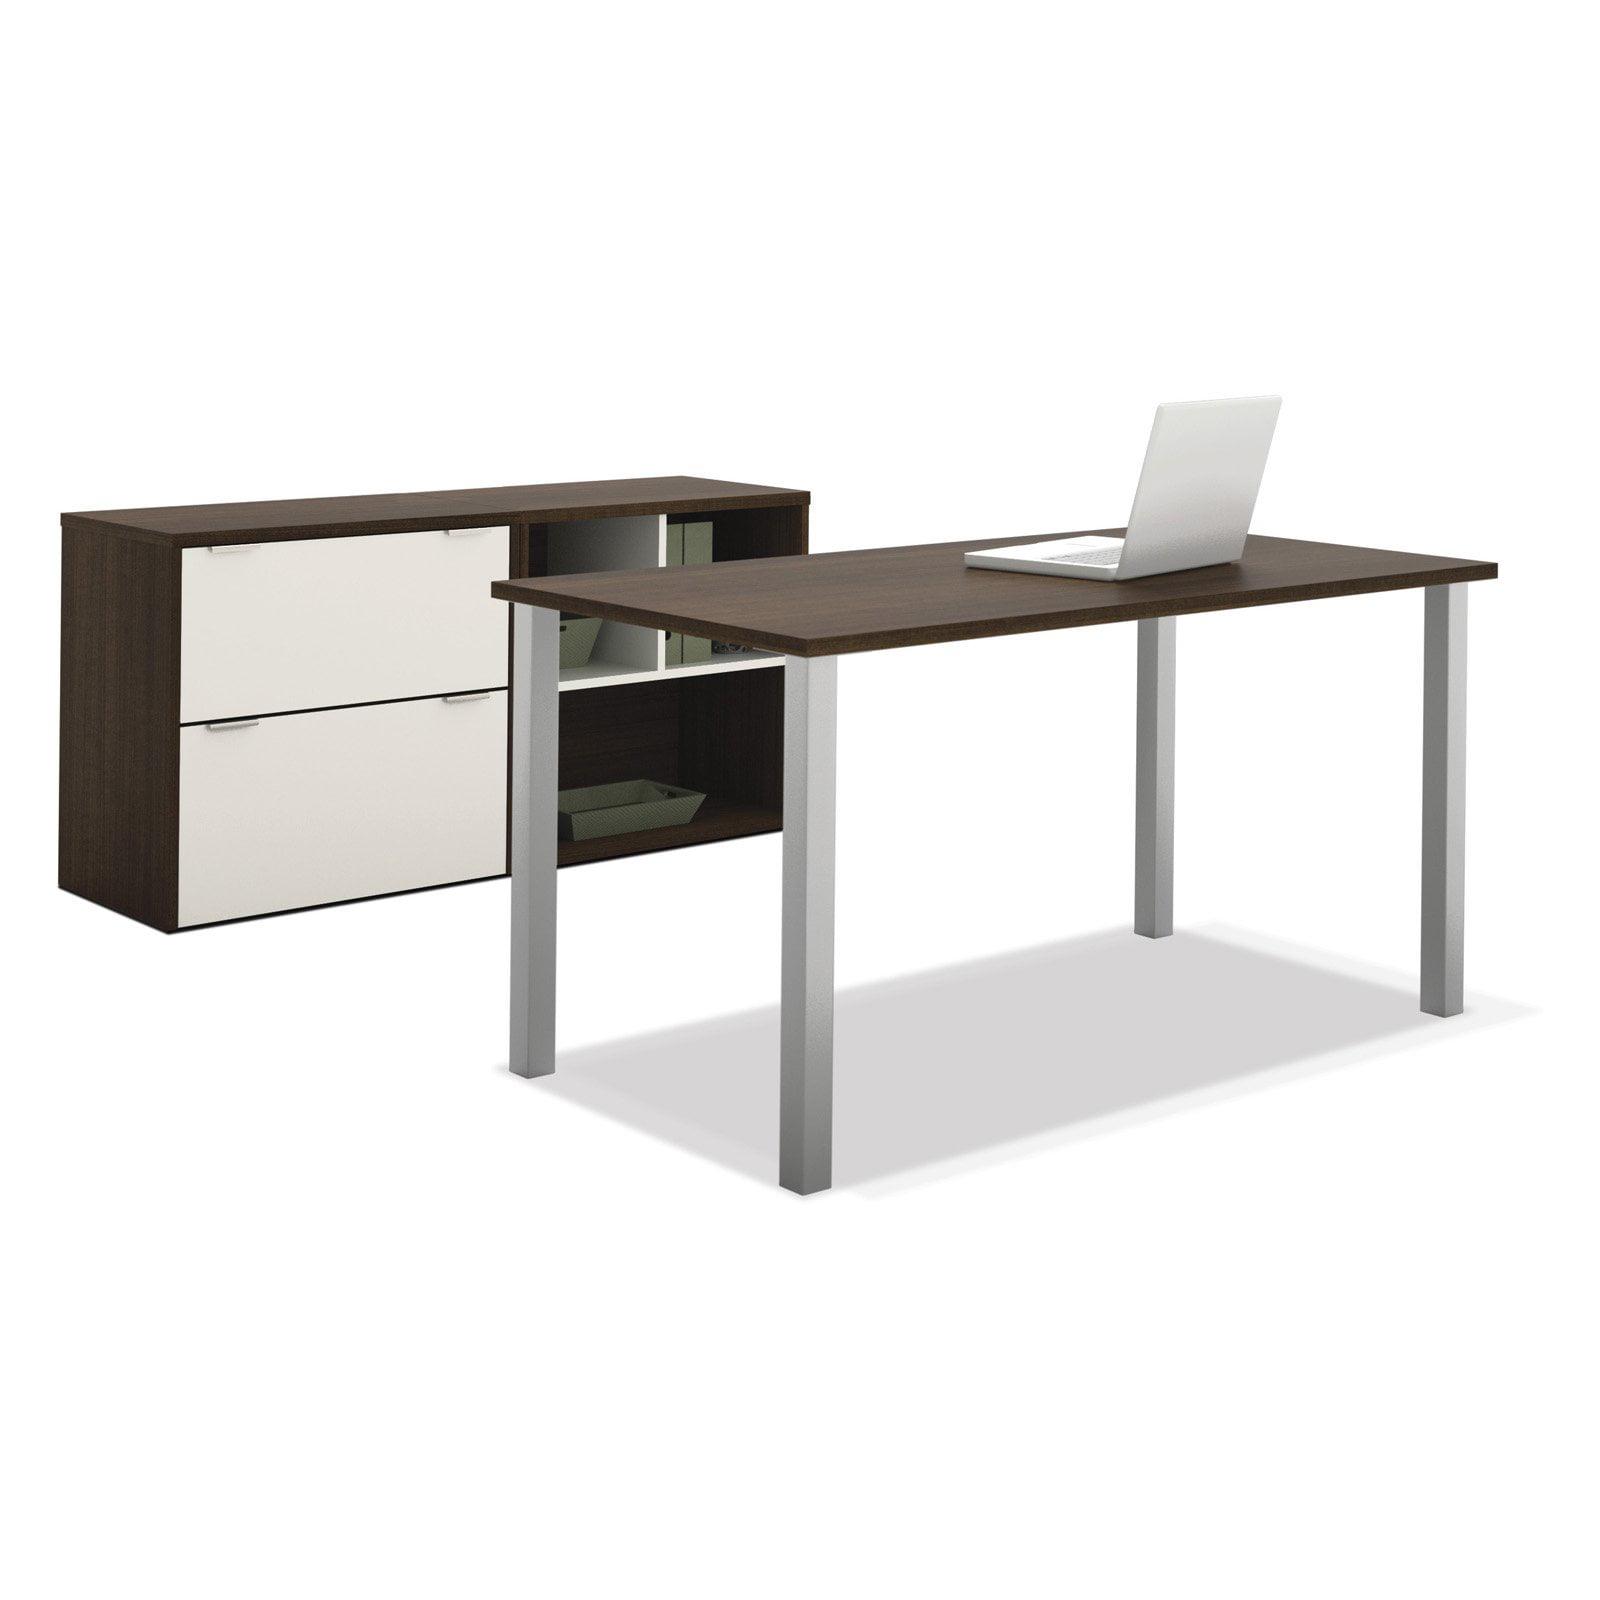 Bestar 50854-60 Contempo Executive Desk Kit Tuxedo   Sandstone by Bestar